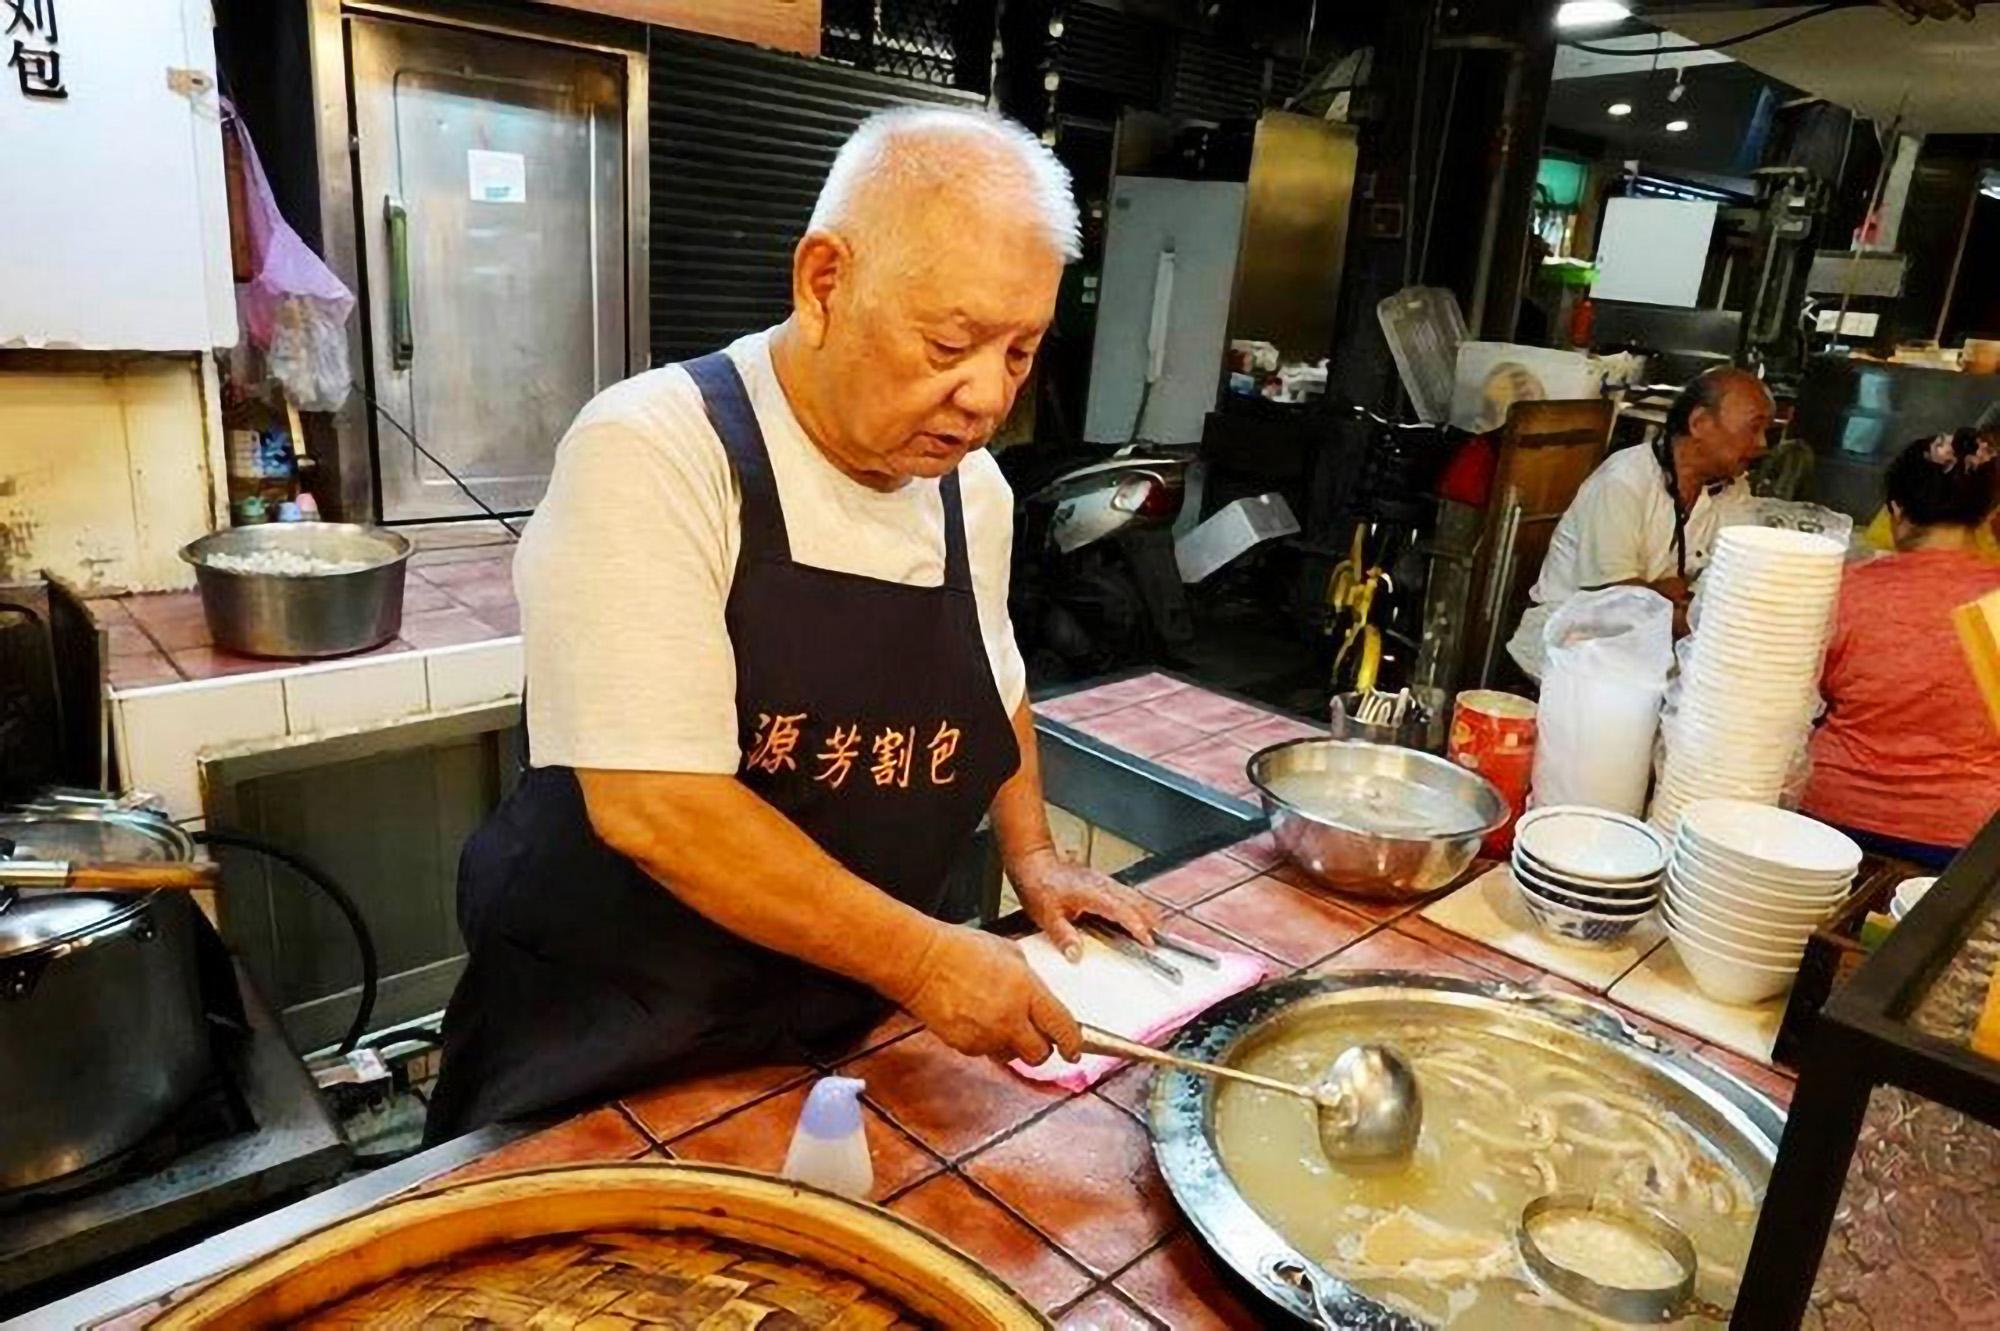 Street Vendor Wins Coveted Spot in Michelin Guide, Alongside World's Top Restaurants